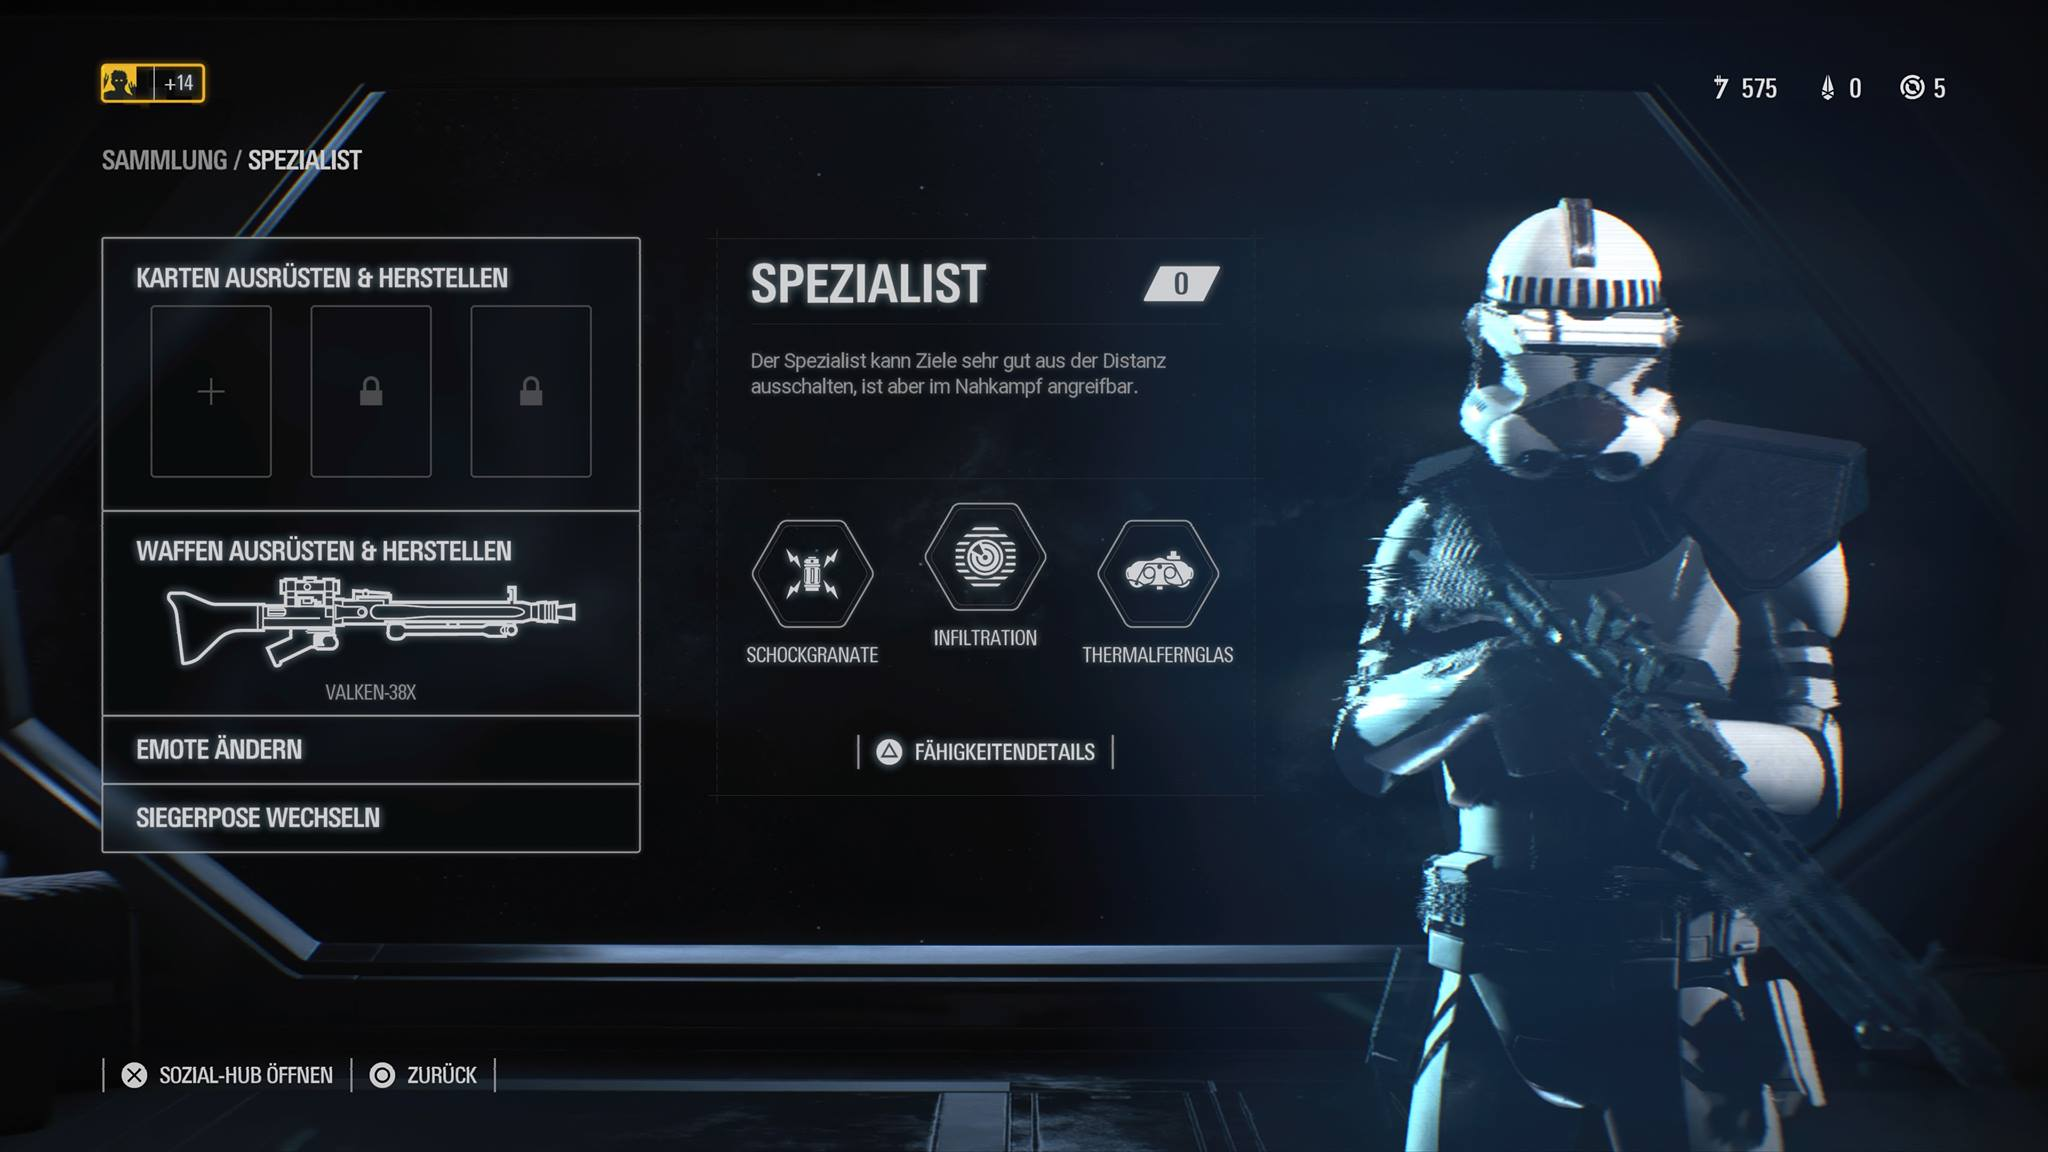 Spieler fordern: Lucasfilm soll EA die Star-Wars-Lizenz wegen Mikrotransaktionen entziehen